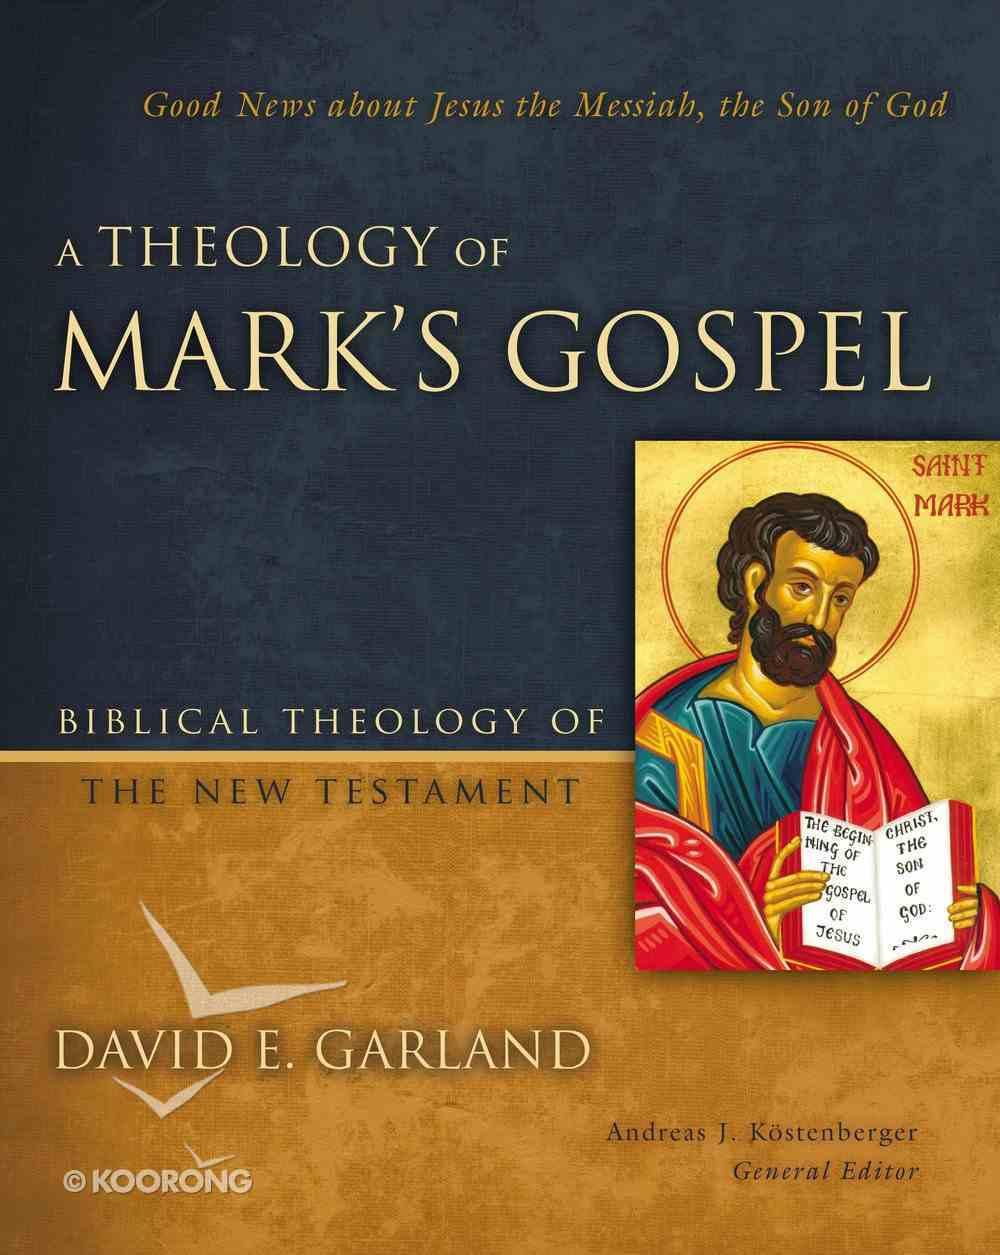 A Theology of Mark's Gospel (Biblical Theology Of The New Testament Series) eBook